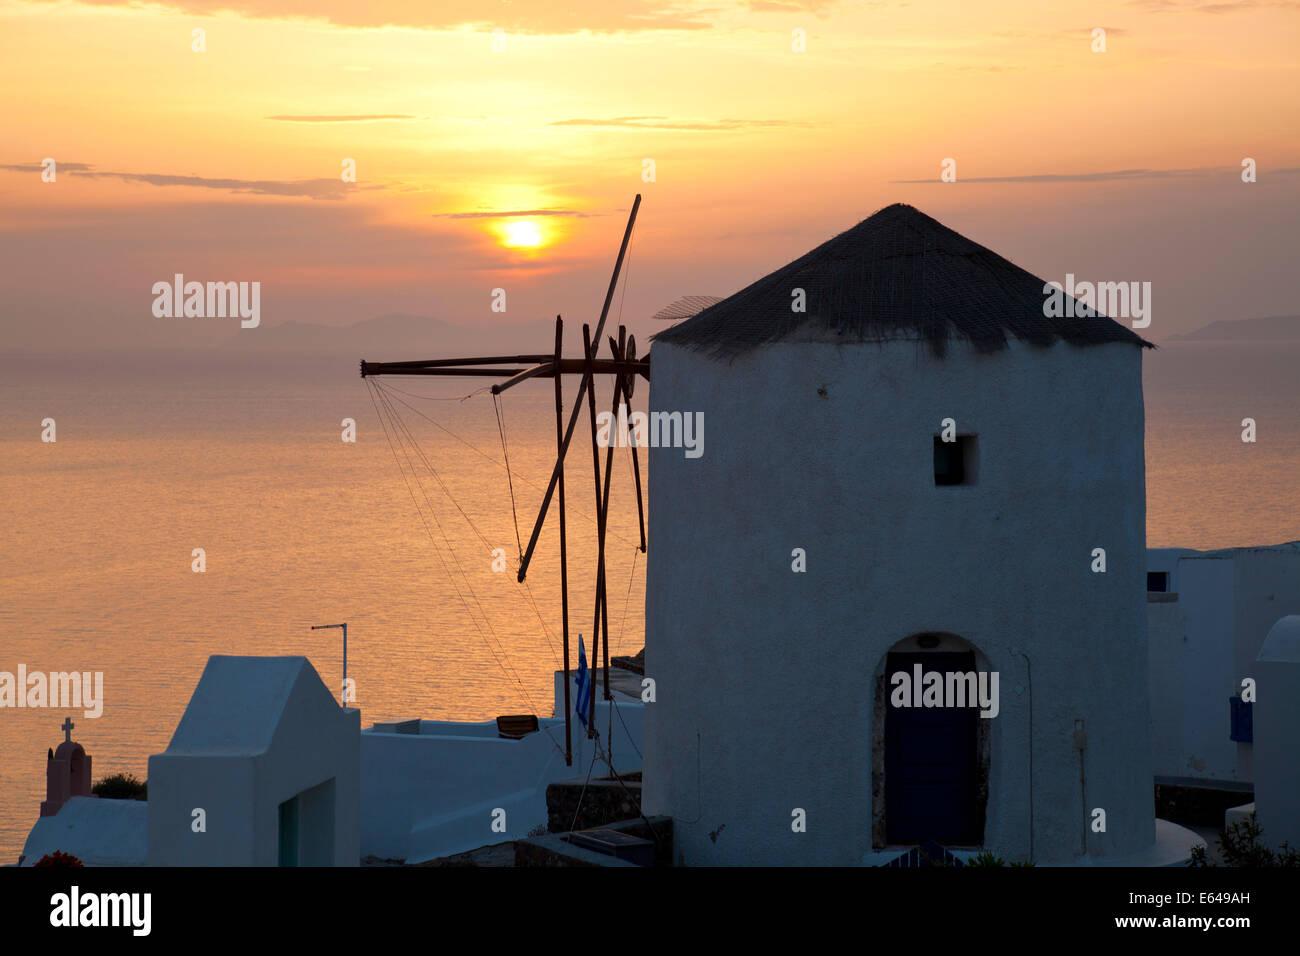 Windmill at sunset, Oia, Santorini, Cyclades islands, Greece - Stock Image